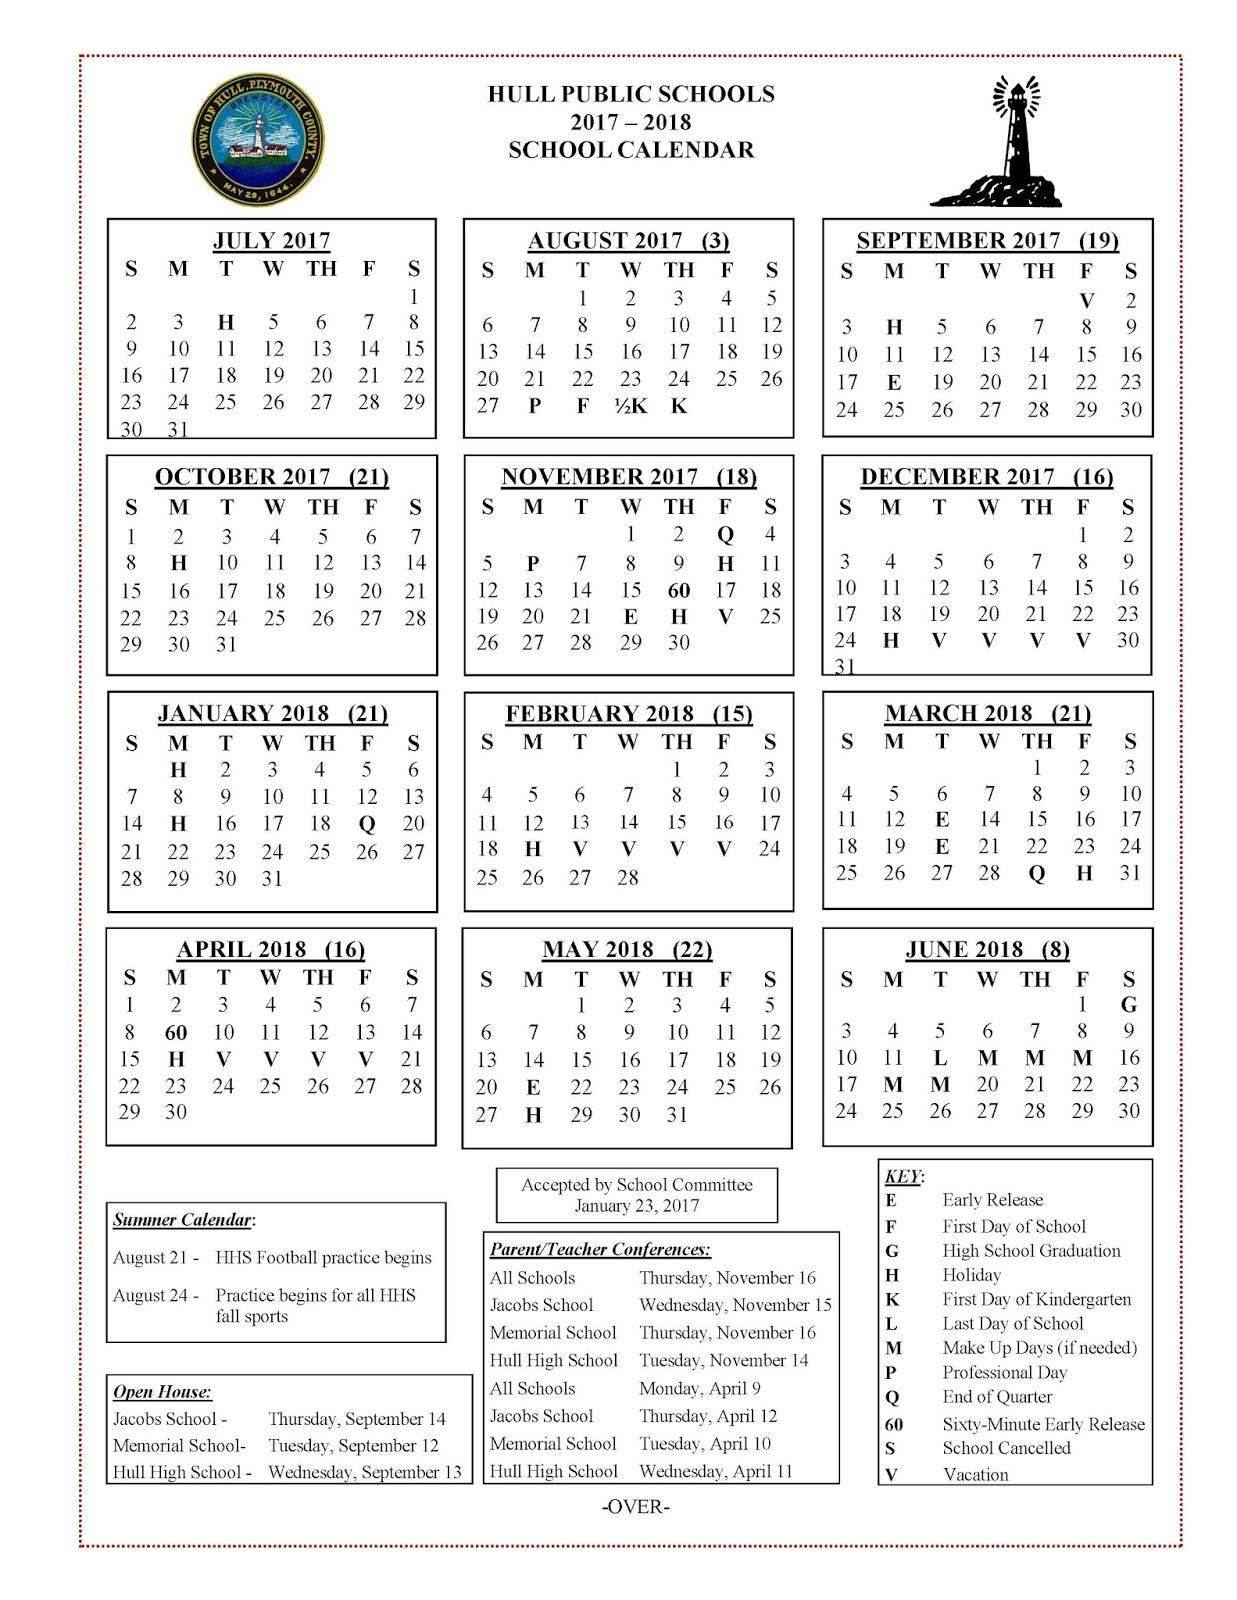 Hull Public Schools Blog: 2017 2018 School Calendar